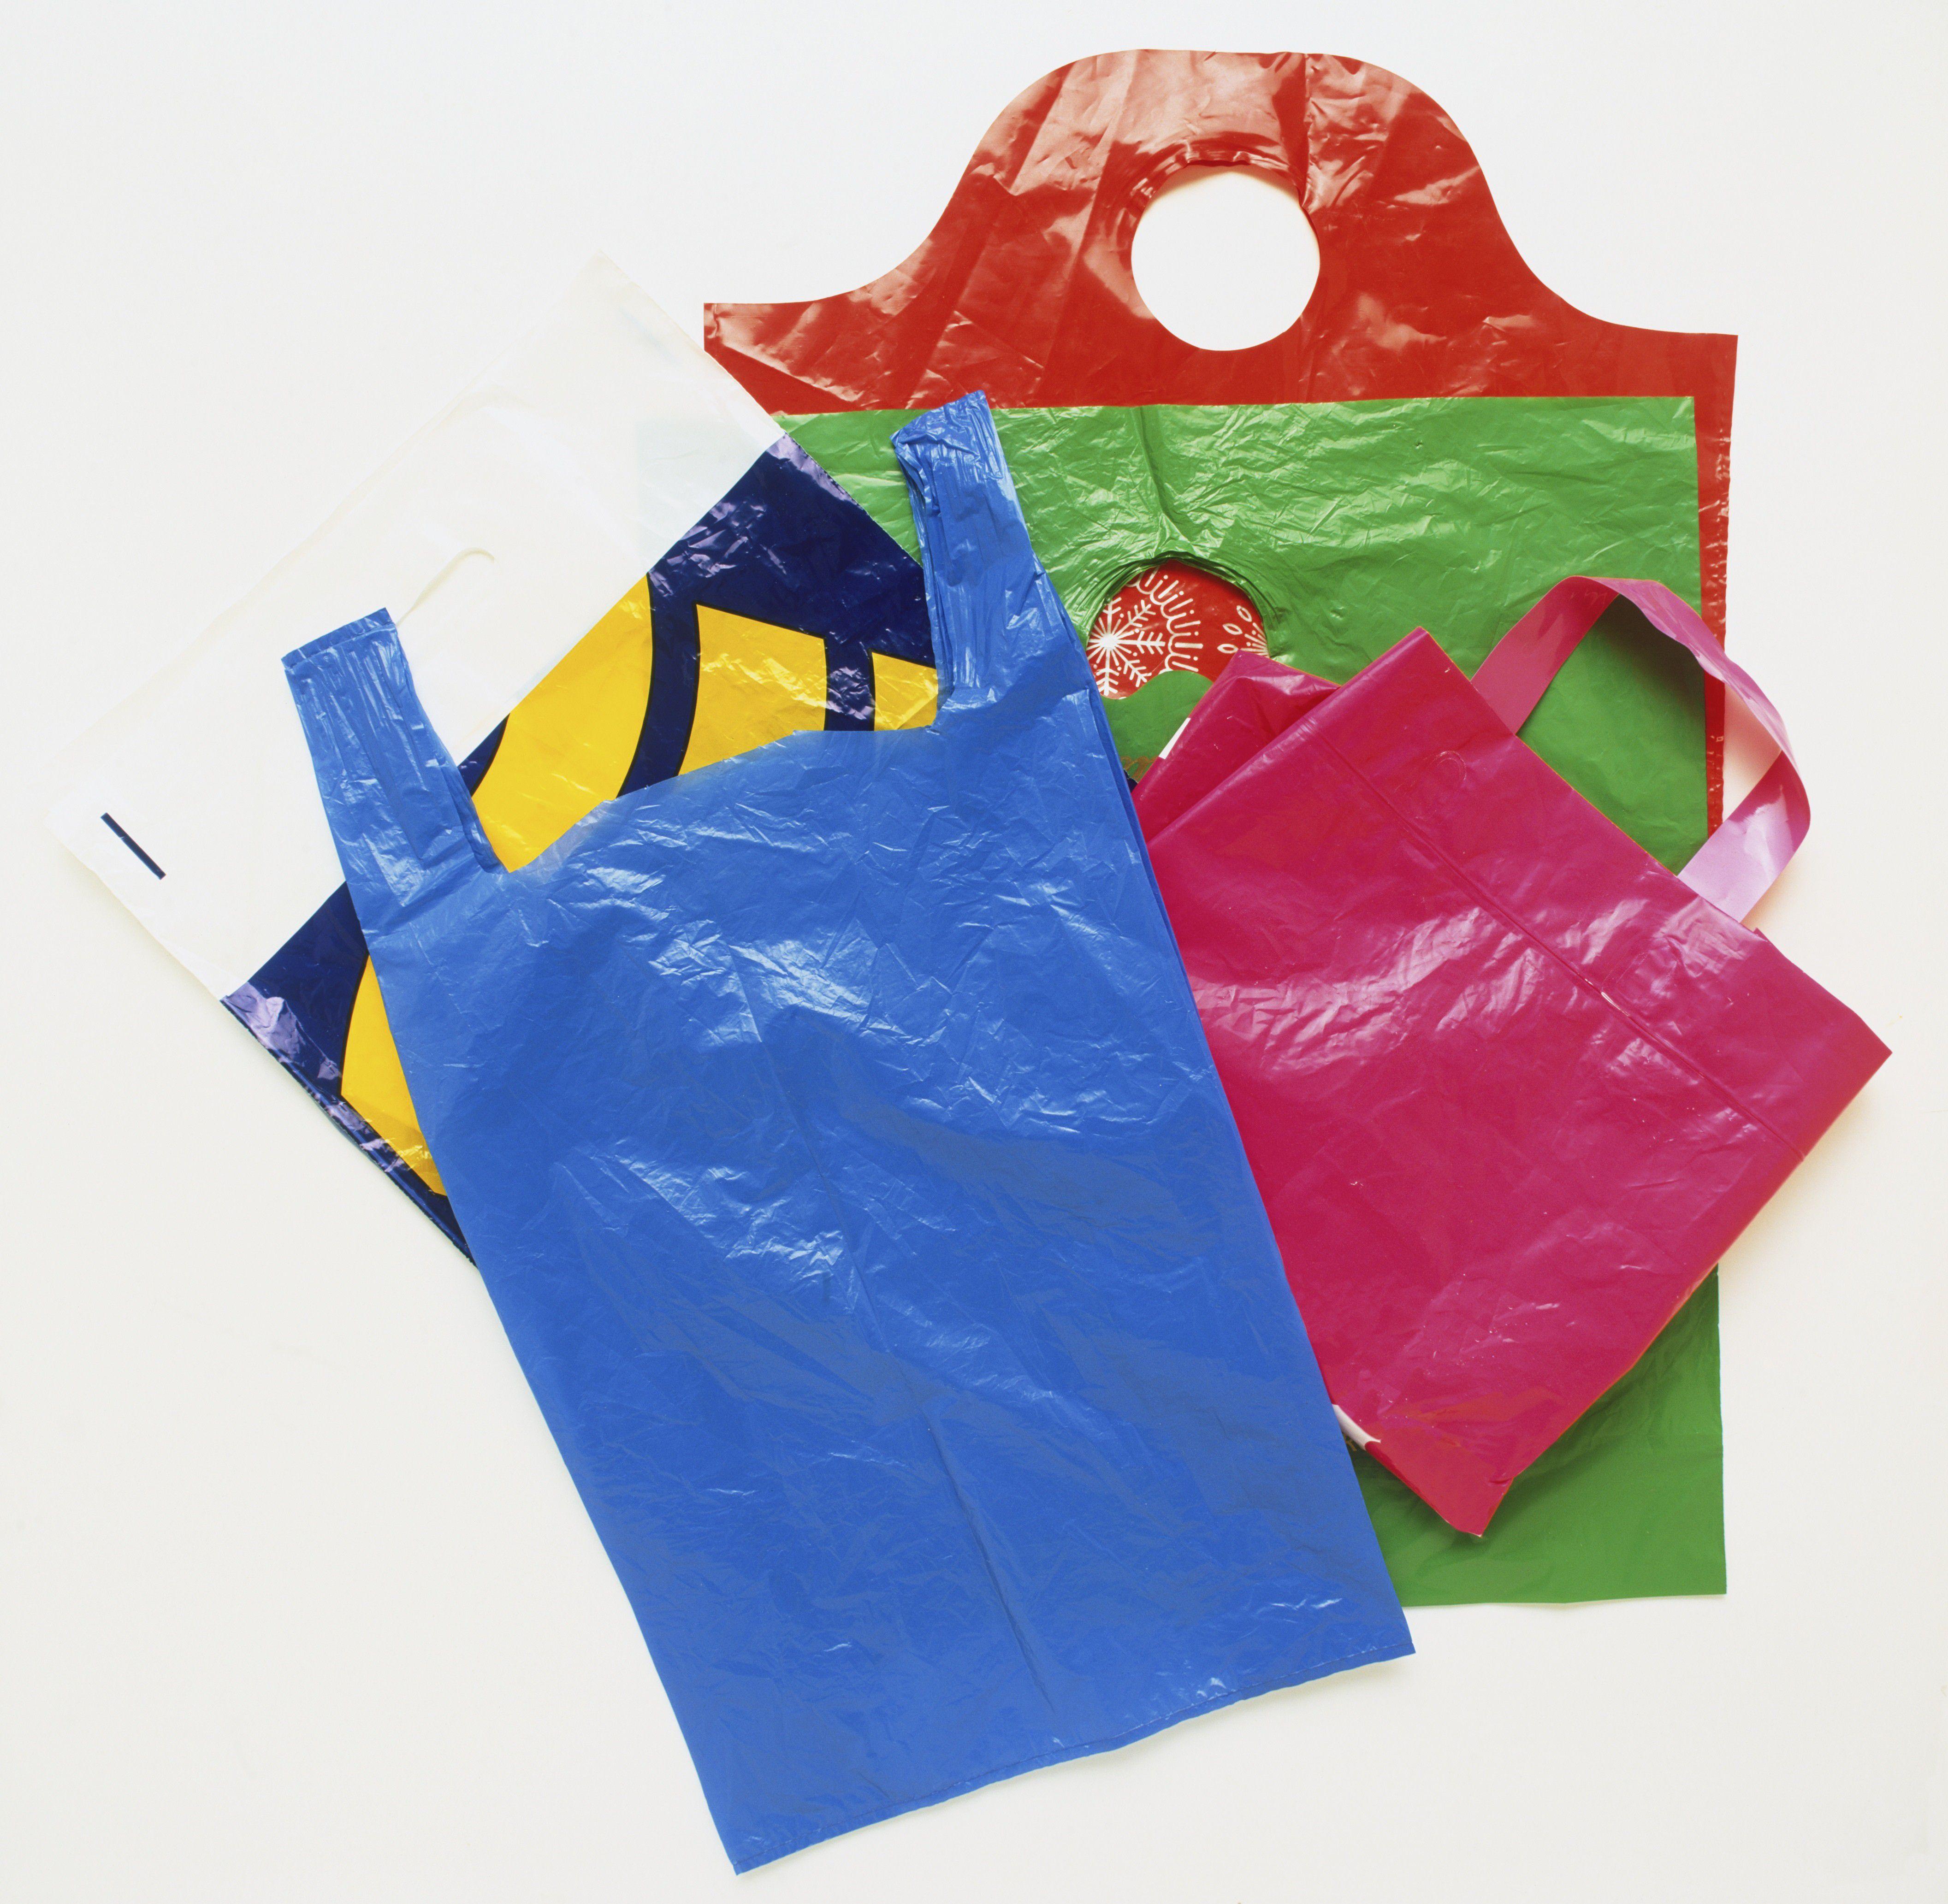 Ideas de reutilización de bolsas de plástico